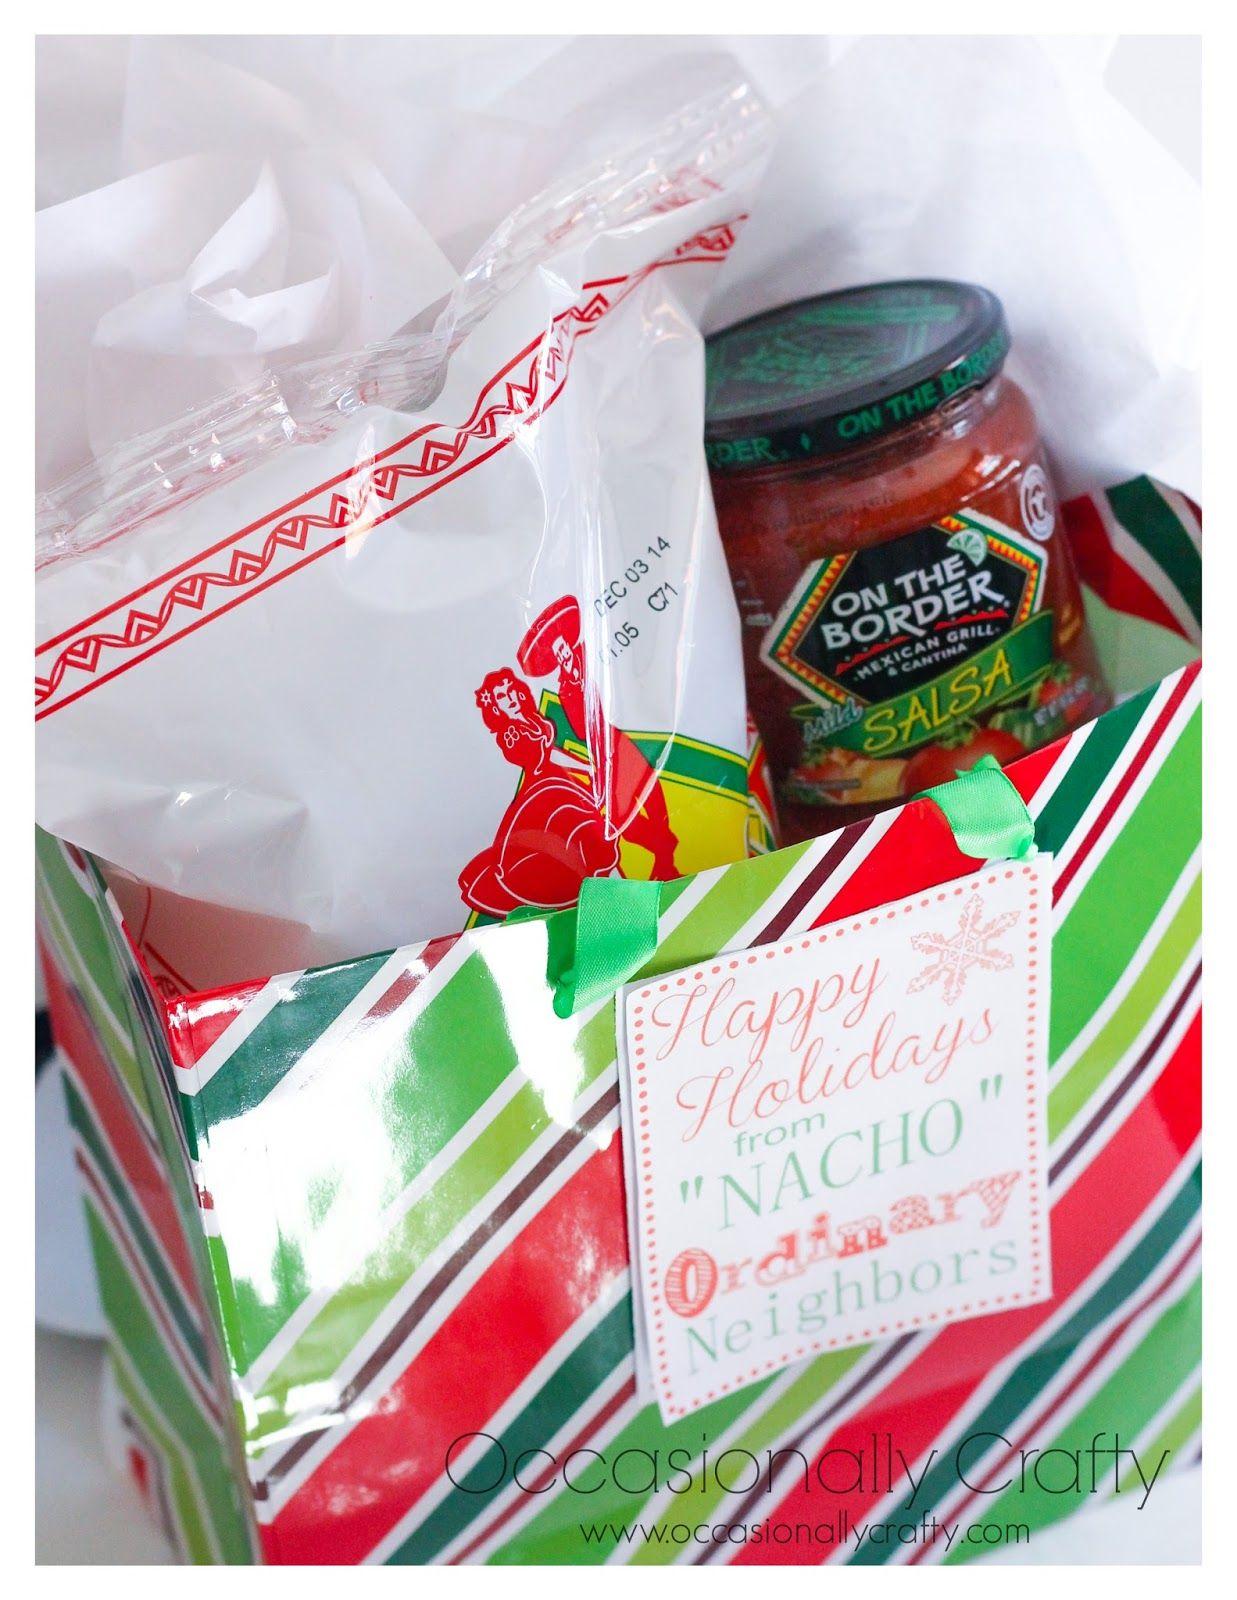 Neighbor Gift Blog Hop Chips And Salsa Printable Tags Neighbor Christmas Gifts Neighbor Gifts Gift Blog